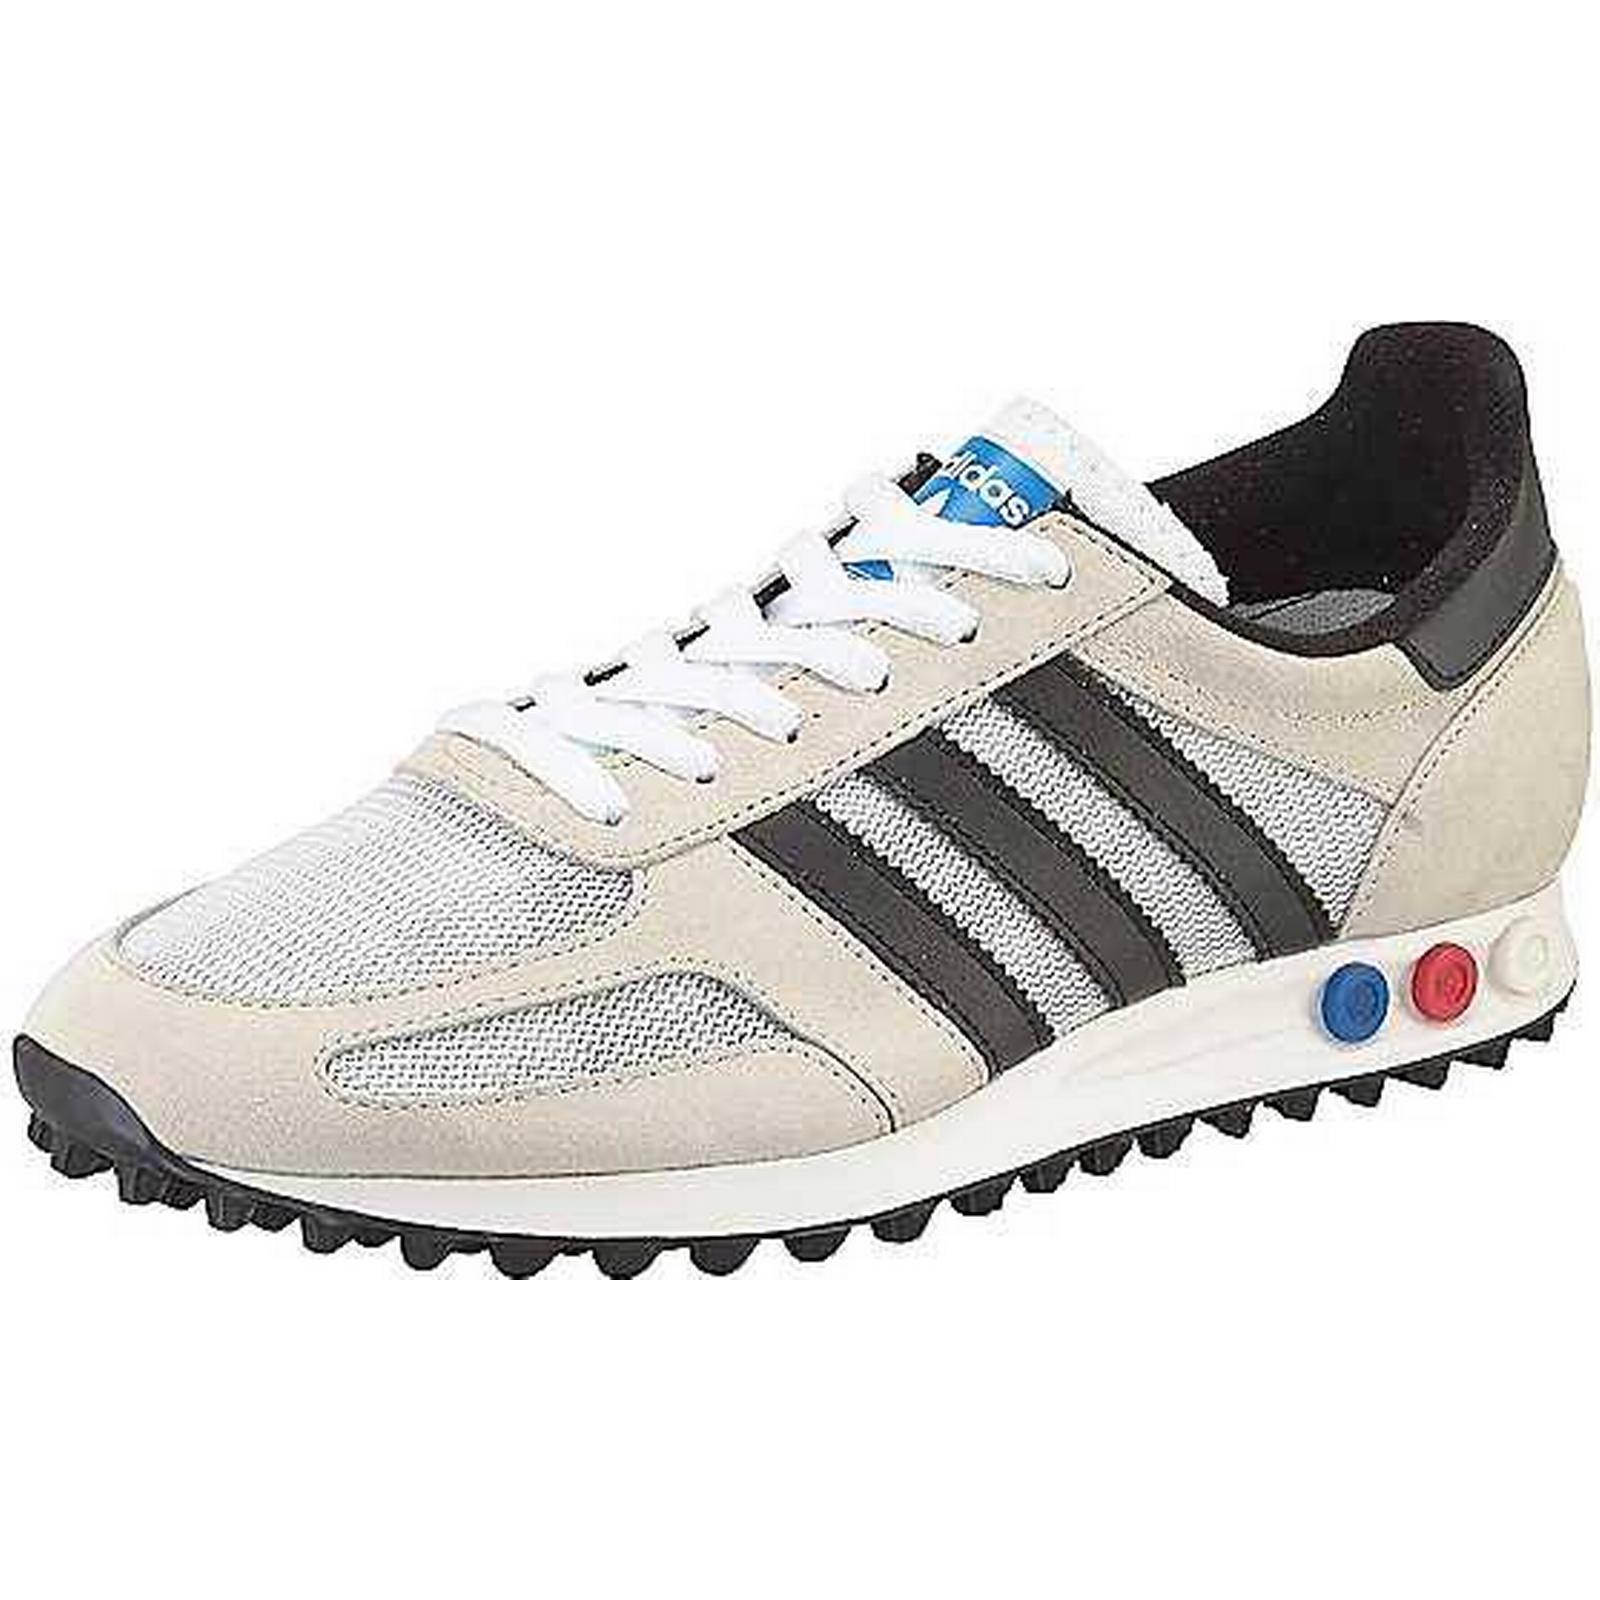 adidas trainer originaux la trainer adidas og formateurs par adidas originaux: hommes femmes: choix des mat c77ebe